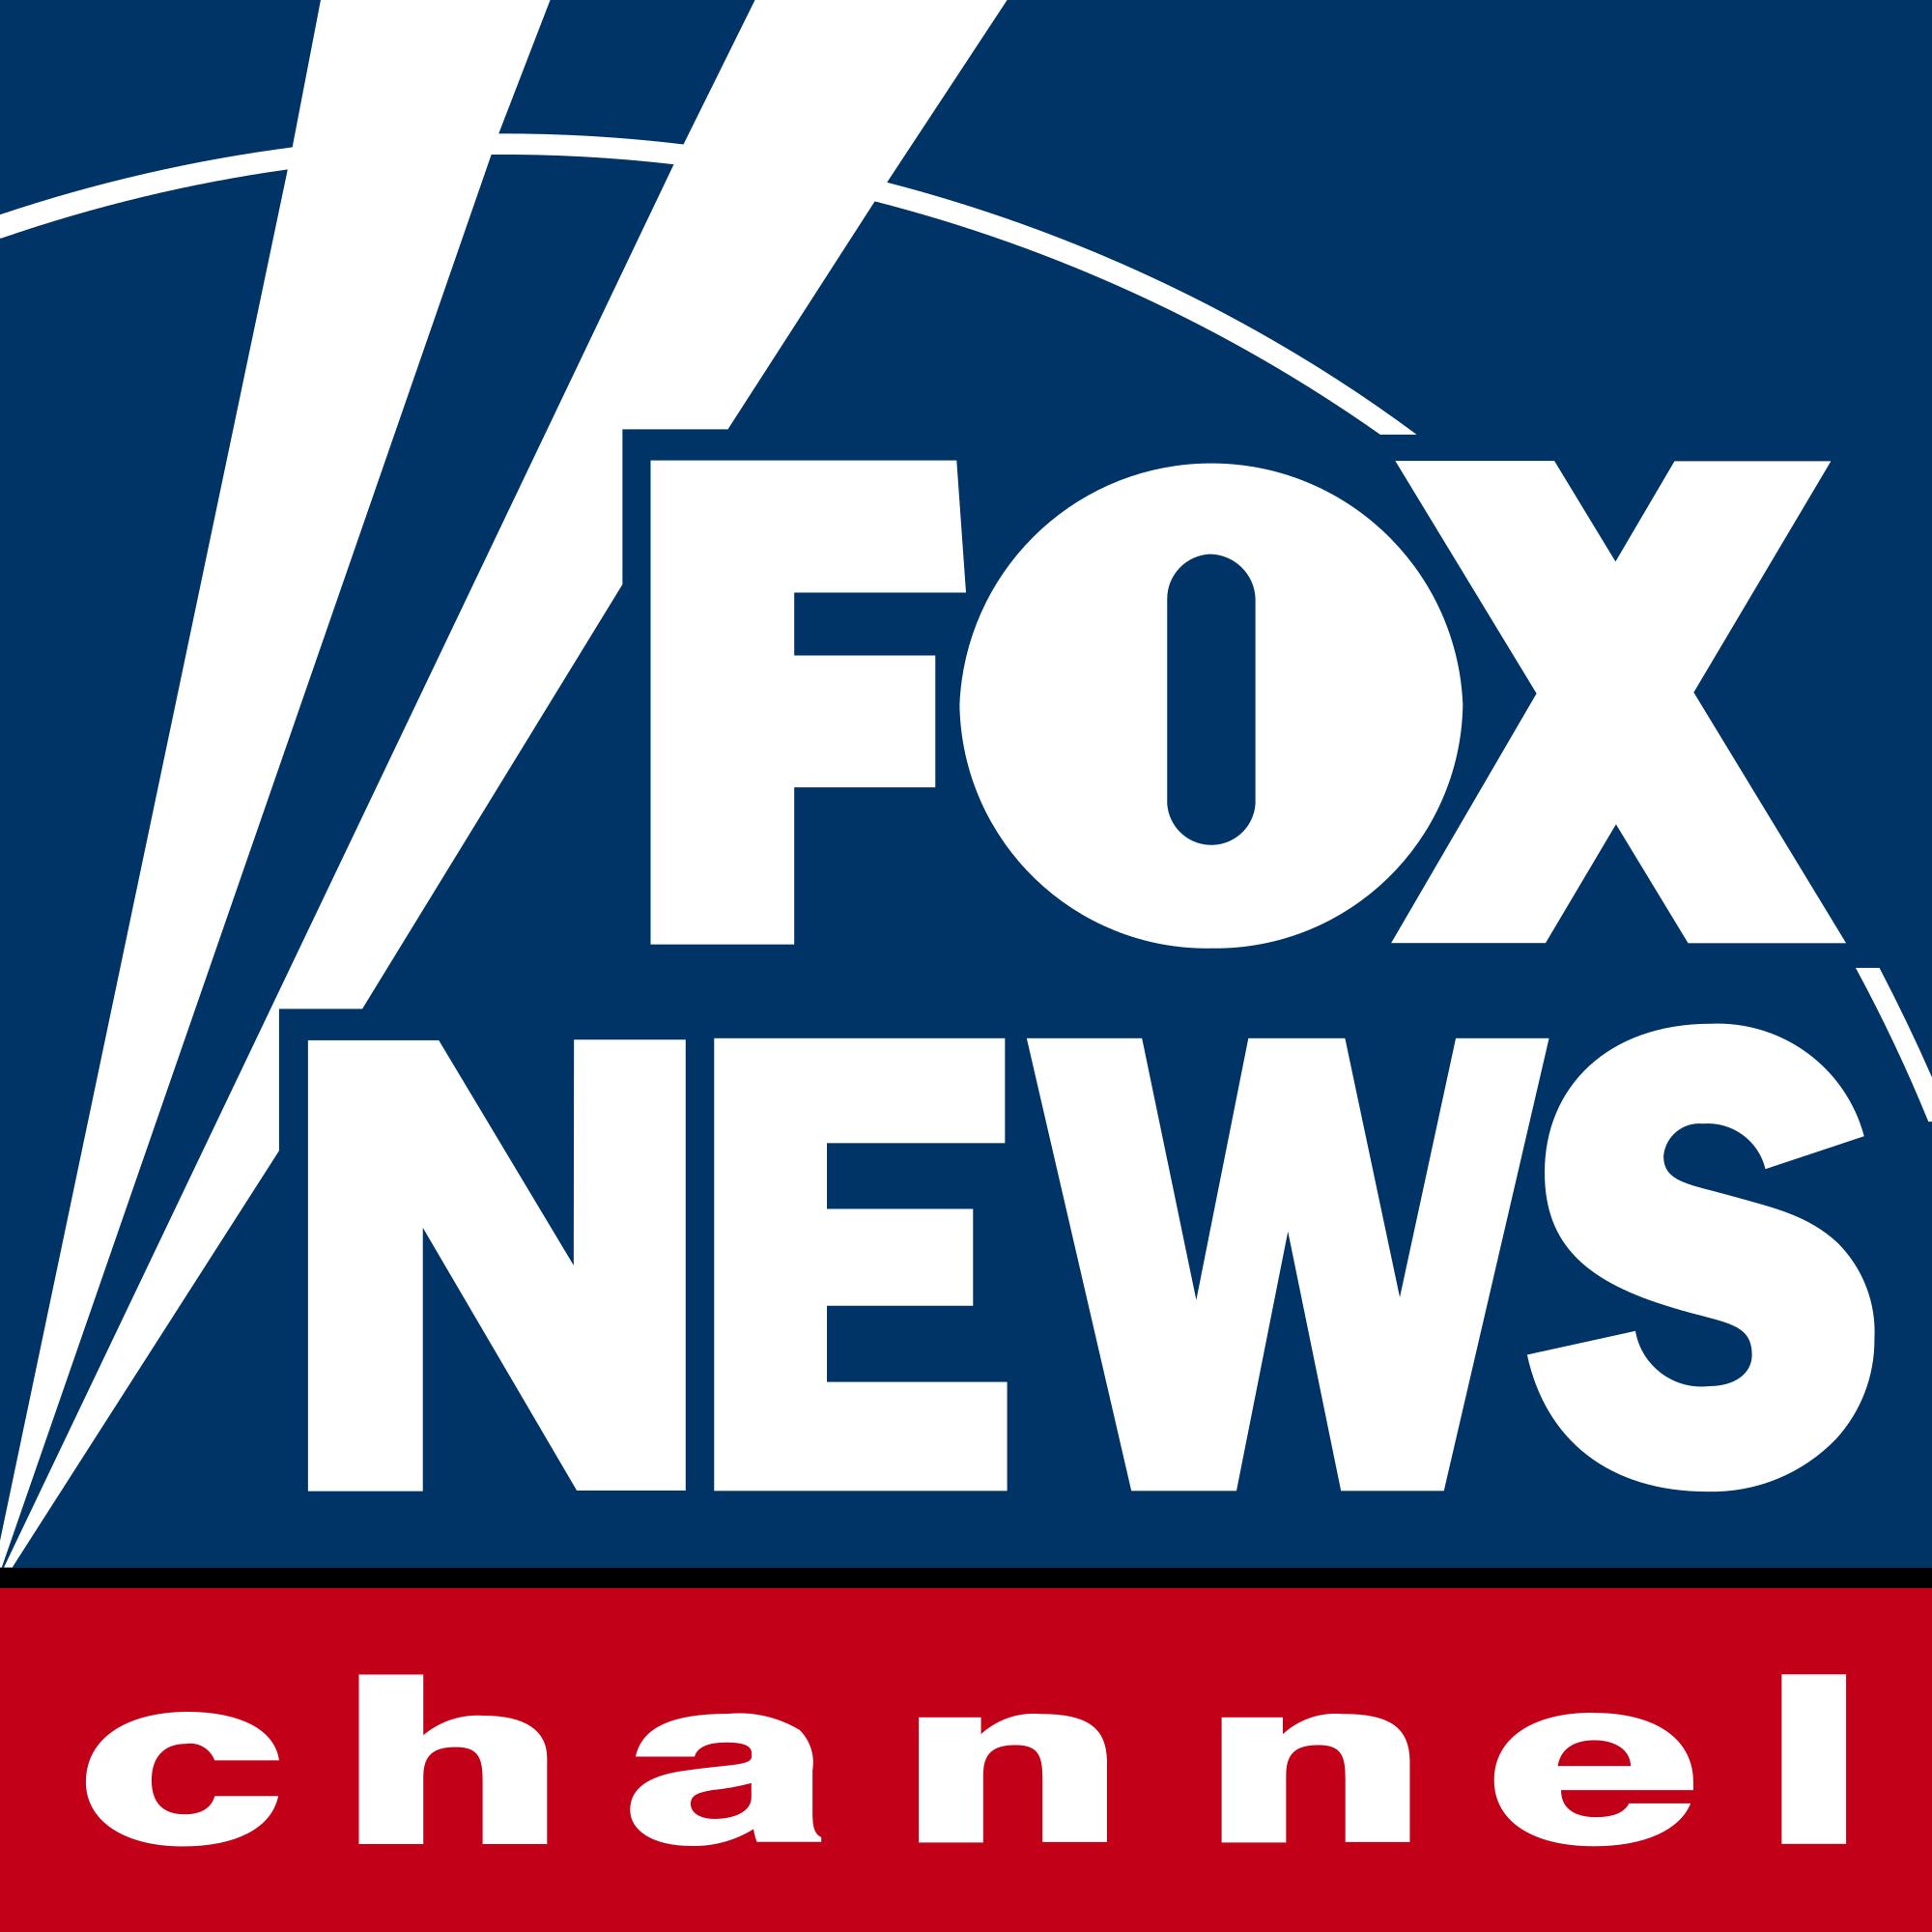 Fox News.